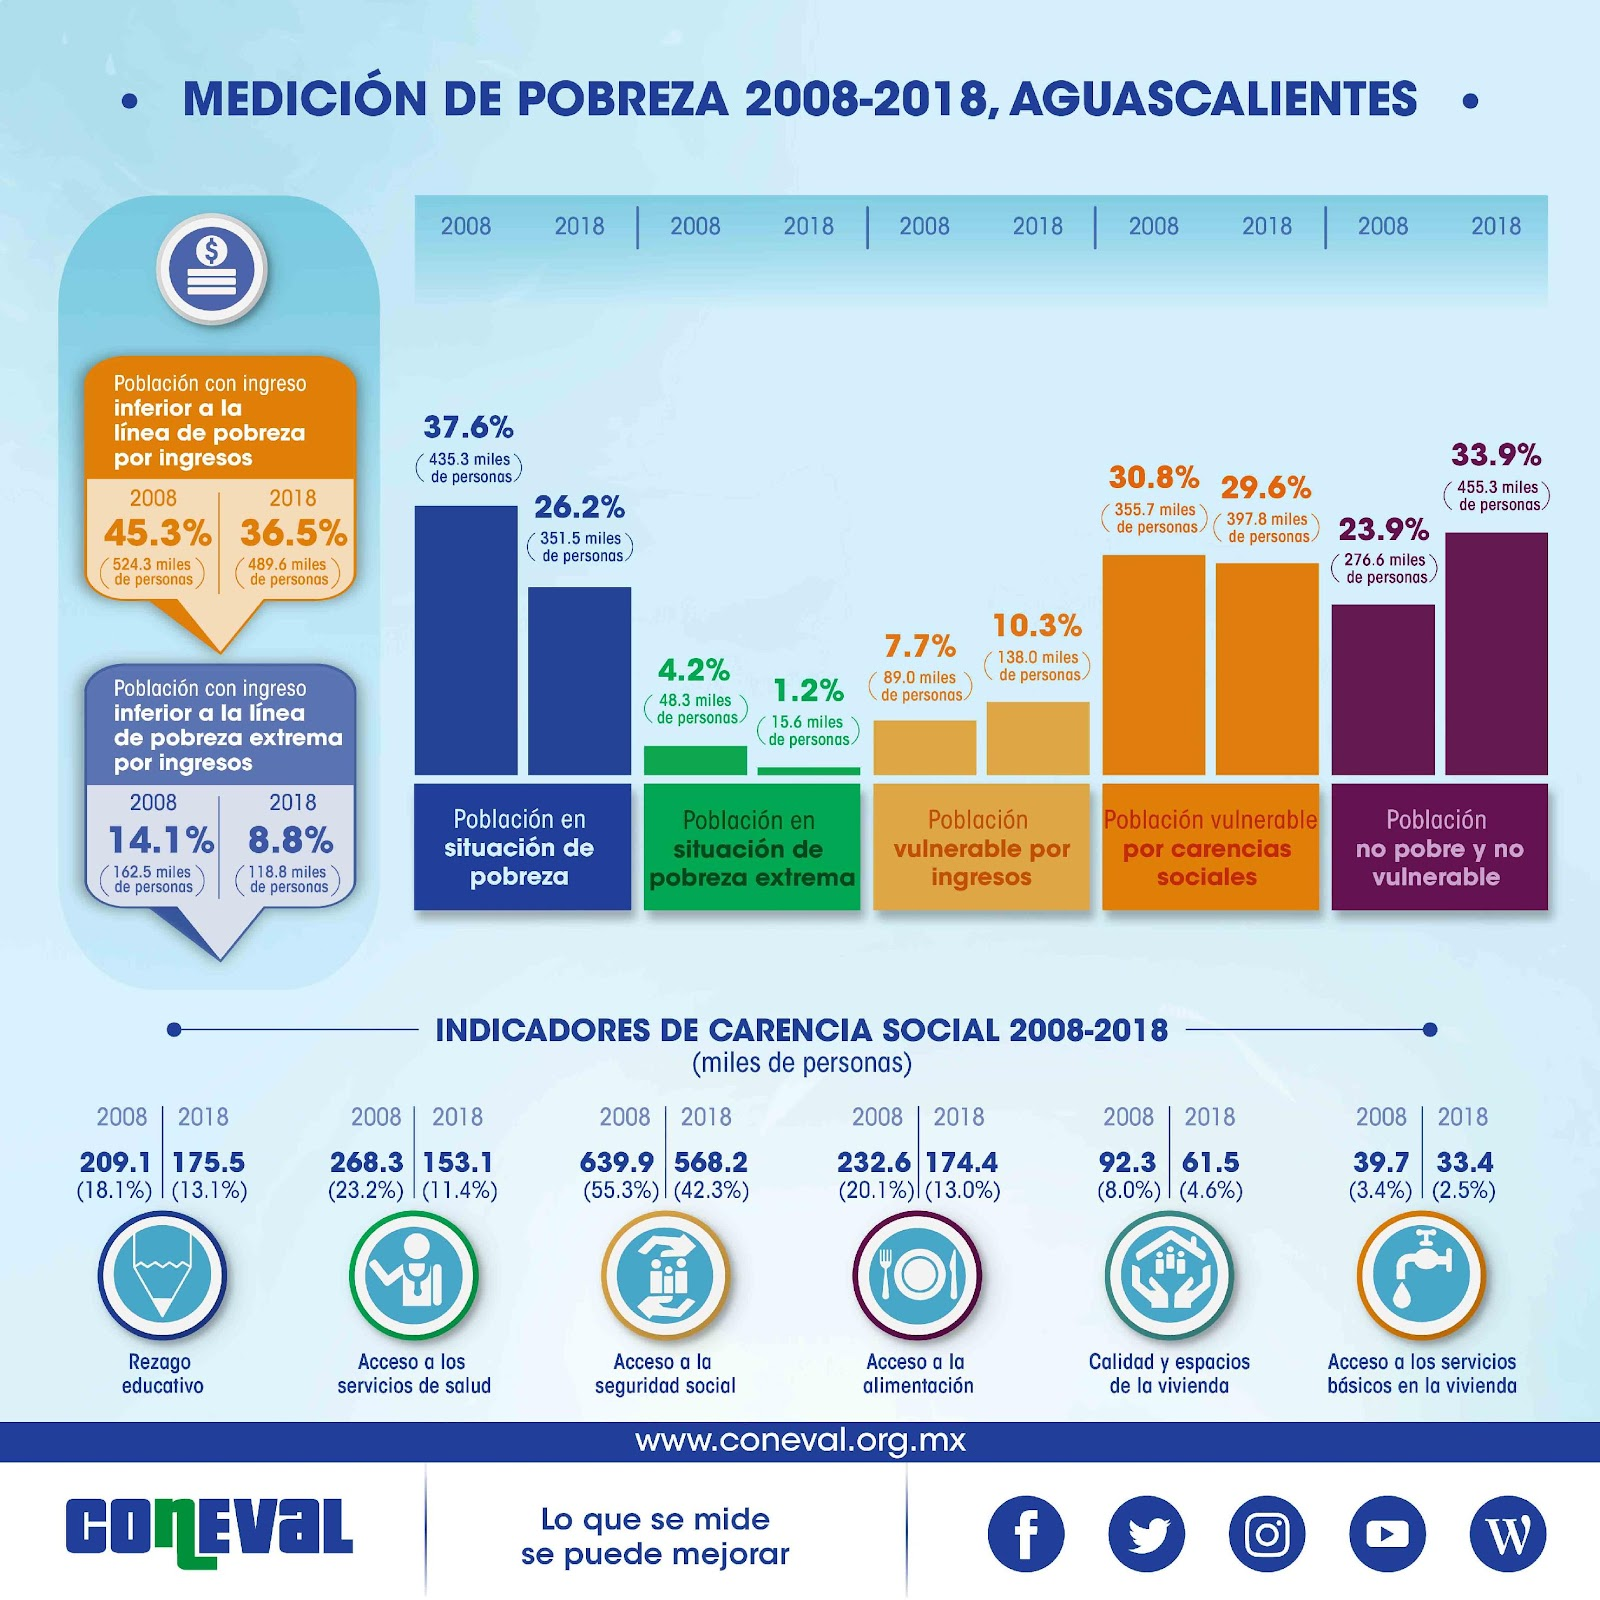 https://www.coneval.org.mx/coordinacion/entidades/Aguascalientes/PublishingImages/Pobreza_2018/Serie_2008-2018.jpg